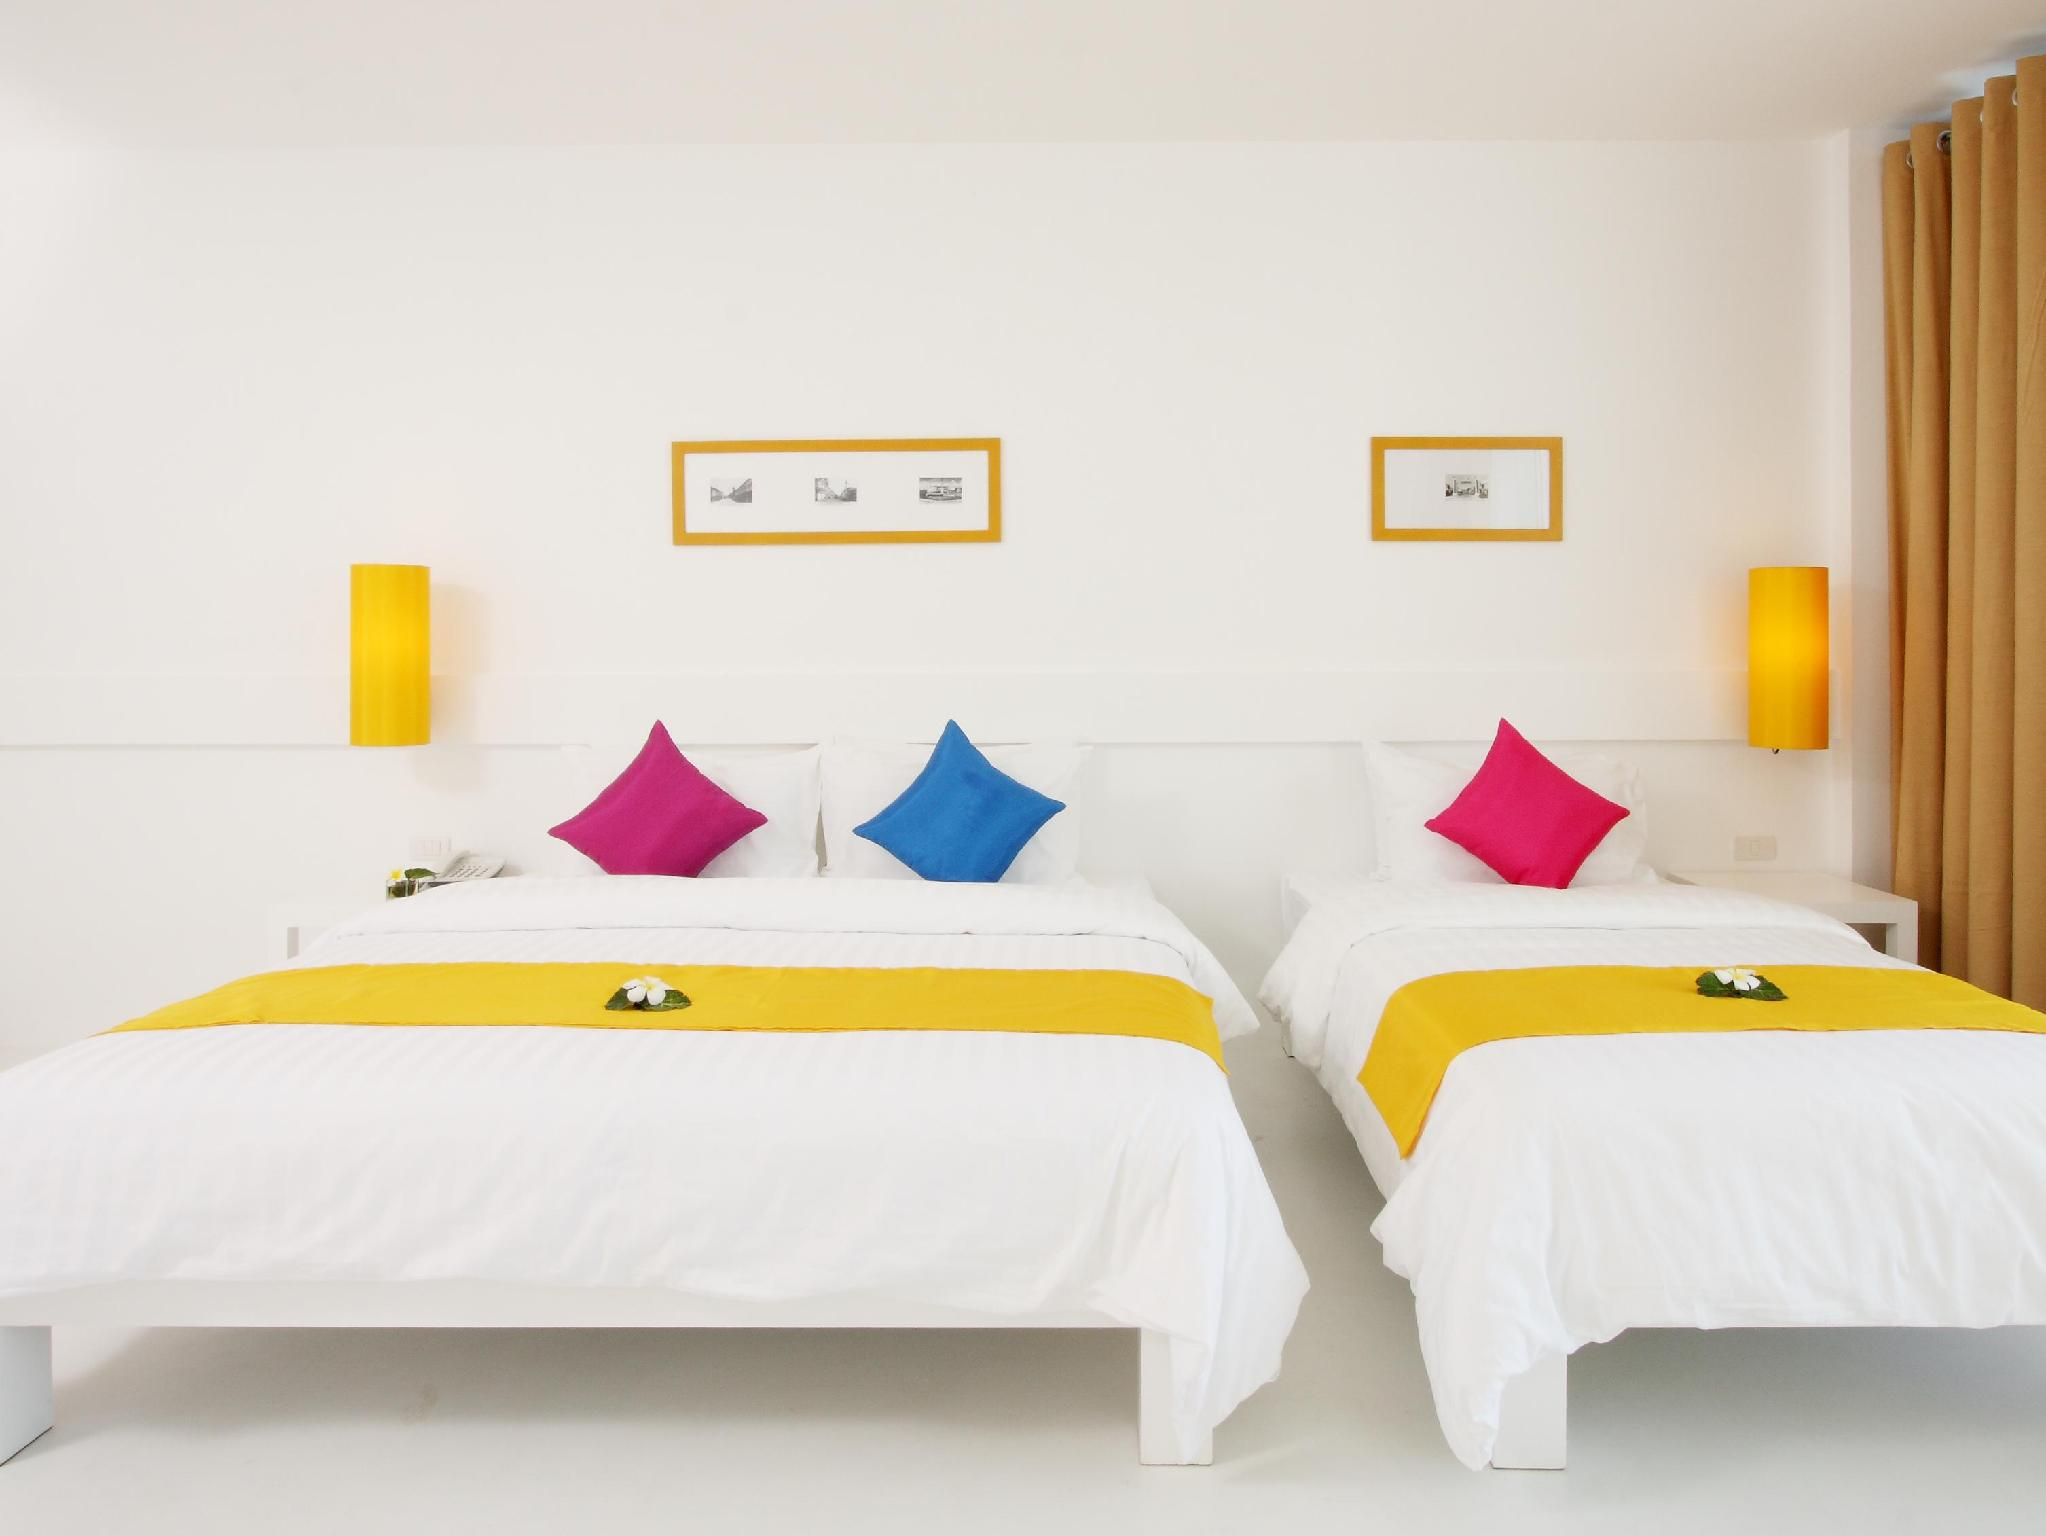 The Old Phuket Karon Beach Resort ดิ โอลด์ ภูเก็ต กะรน บีช รีสอร์ท